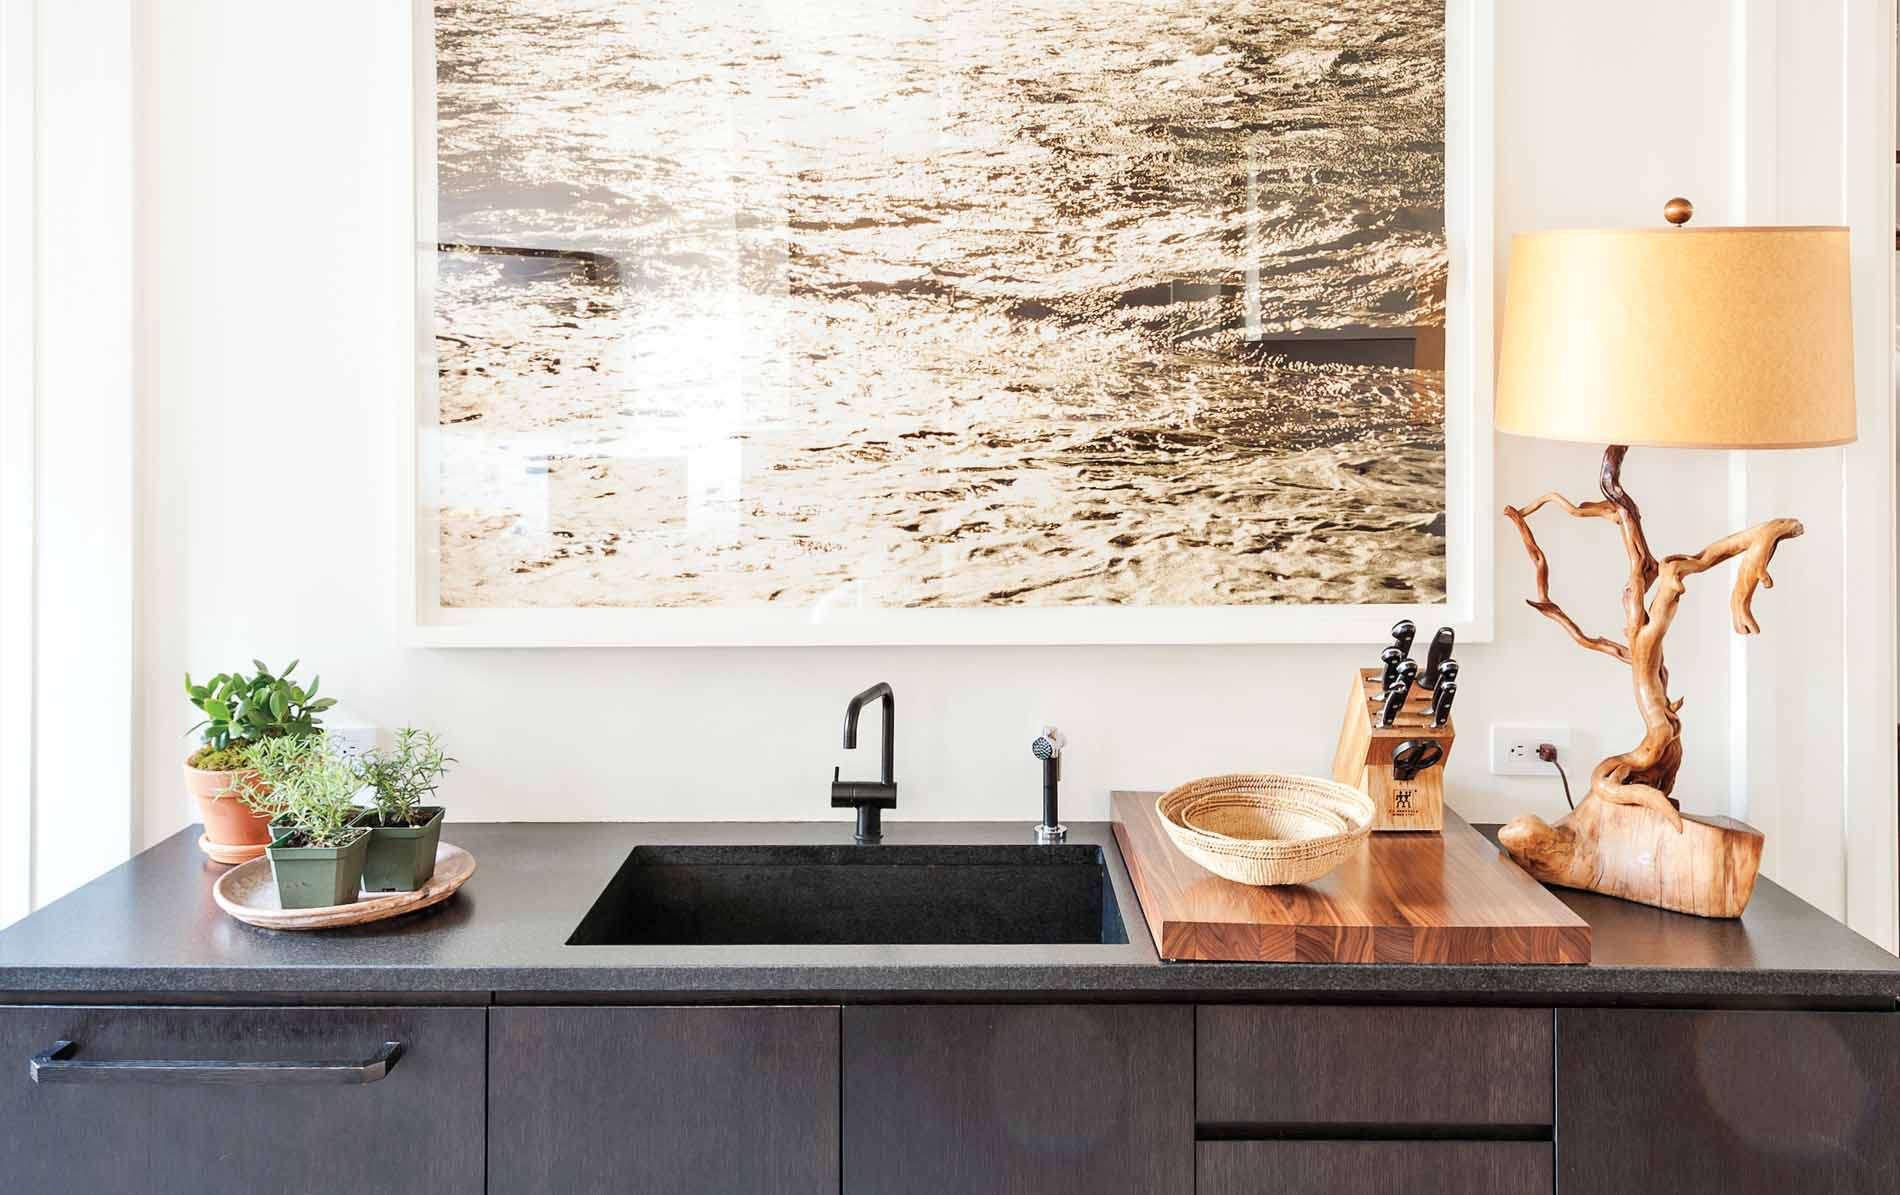 Kitchen Sinks | Get Me Cooking